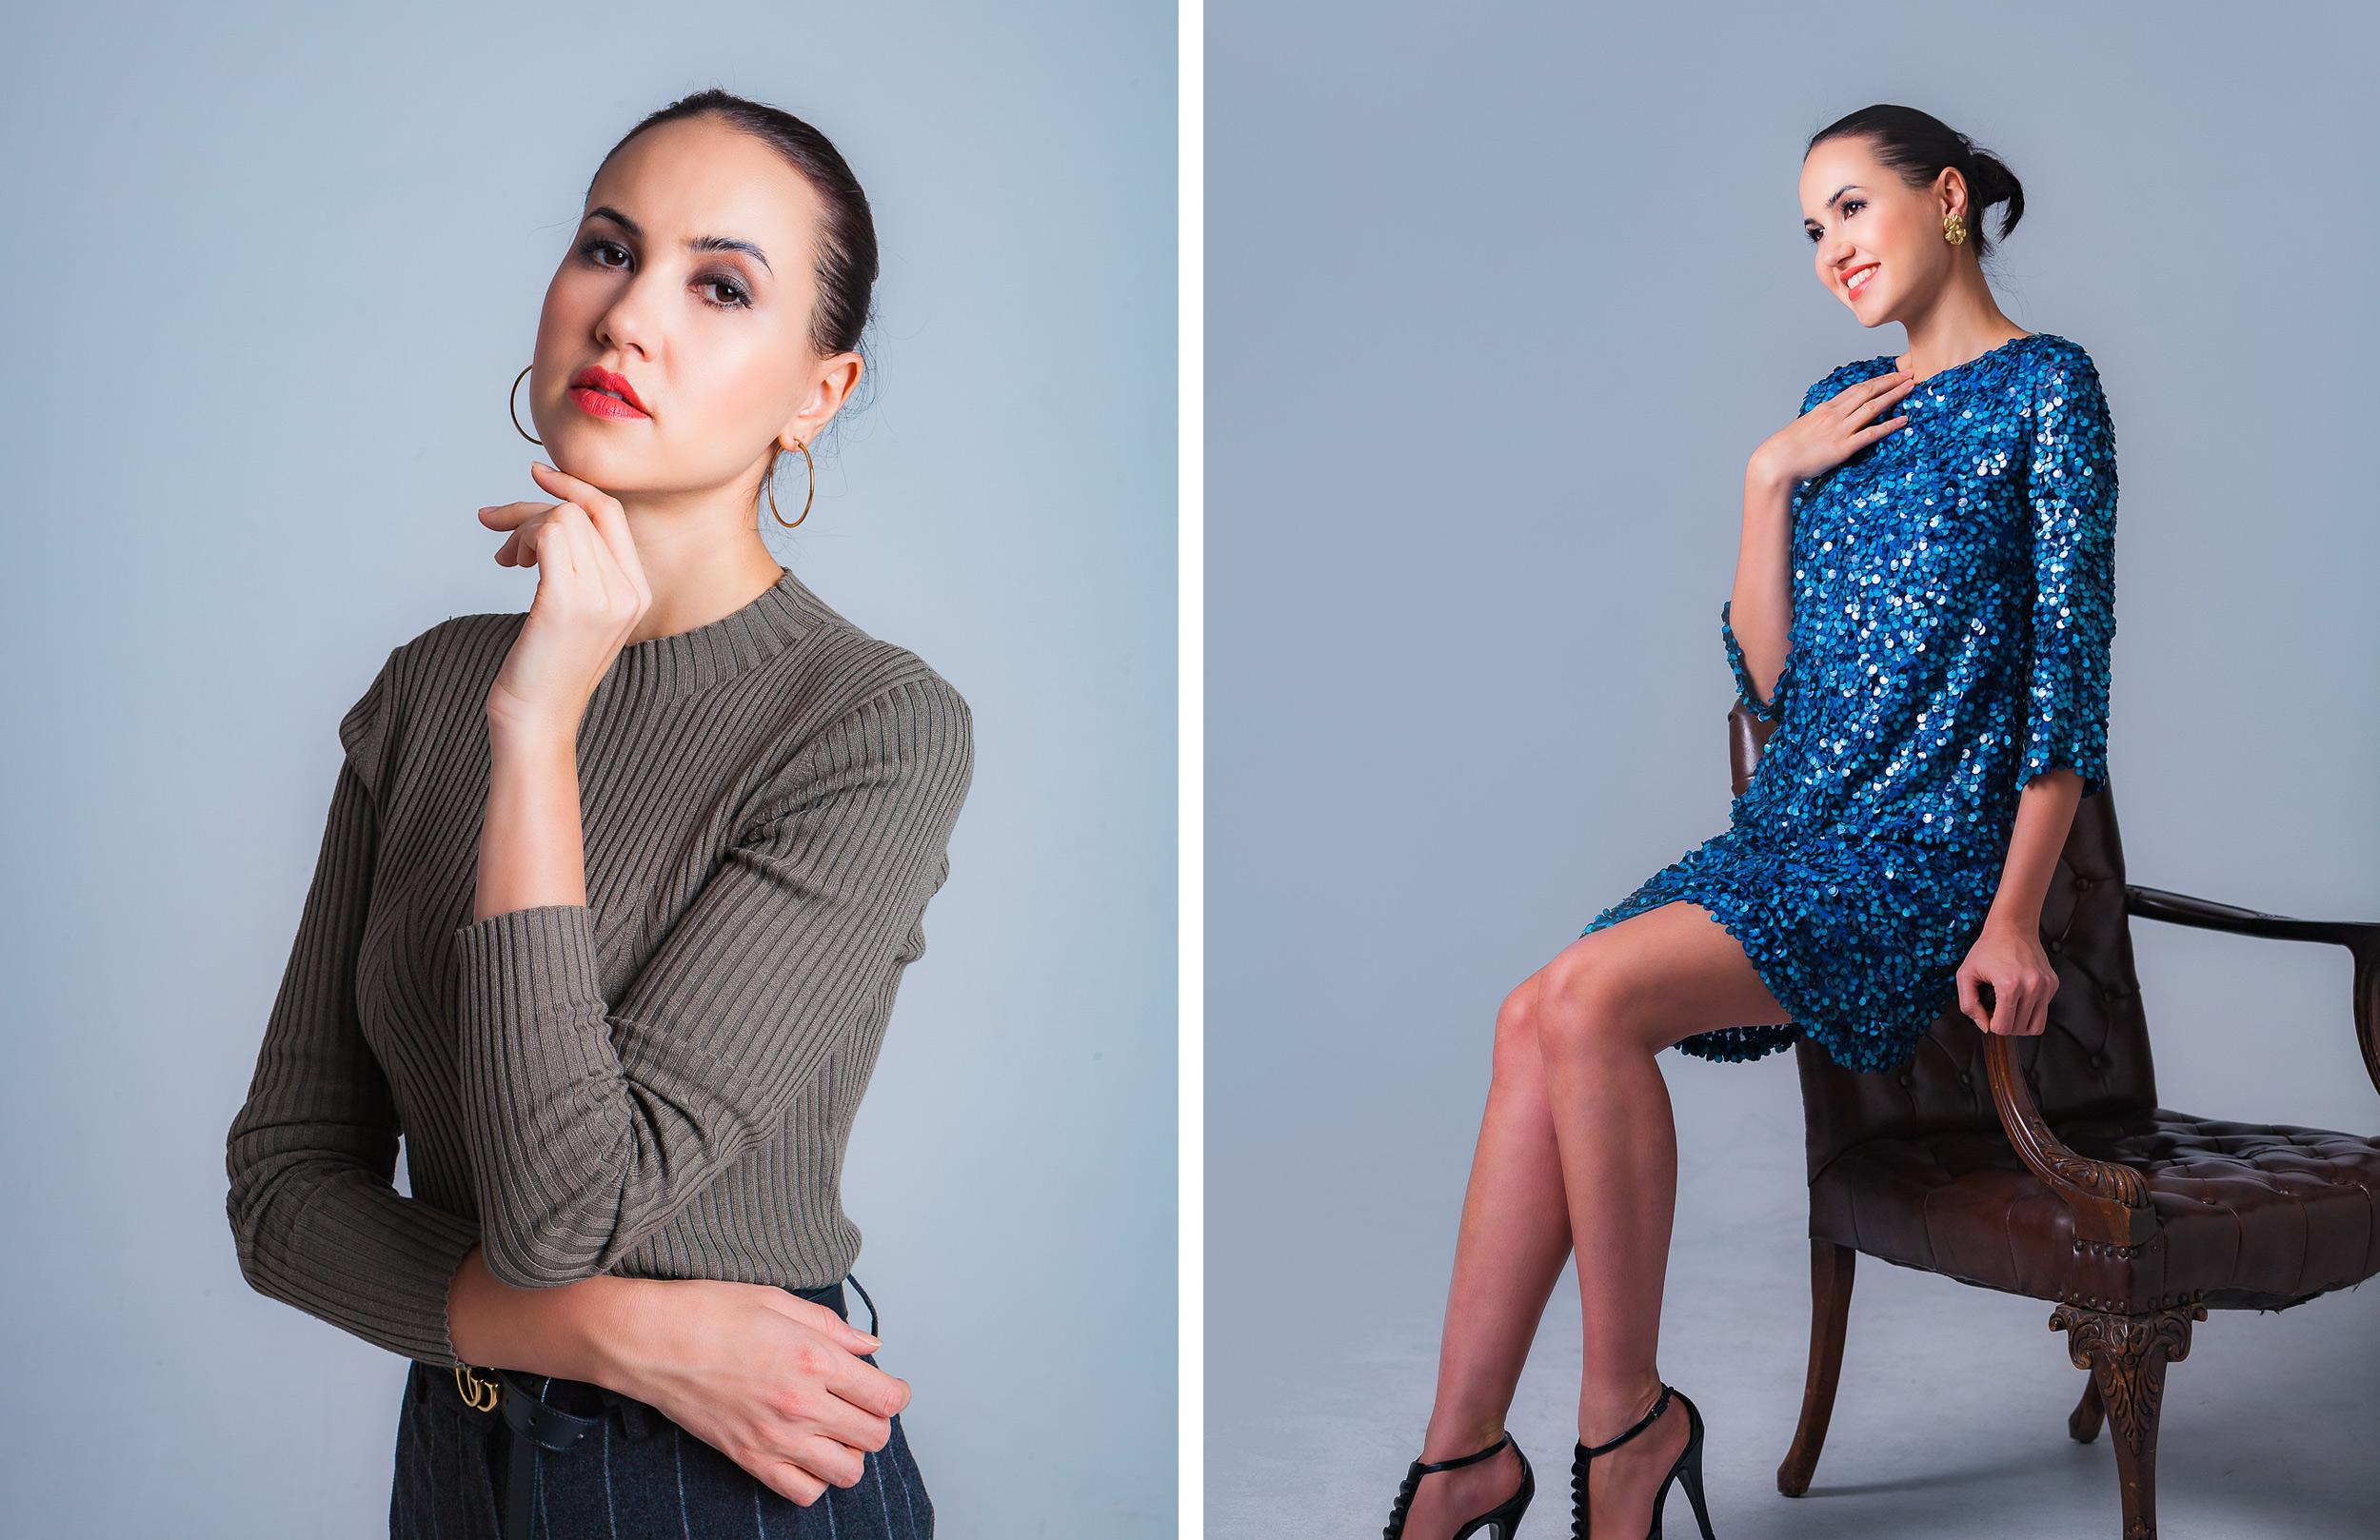 Women Fashion Photography by FullMotion Photos+Cinema - Kenny Chan